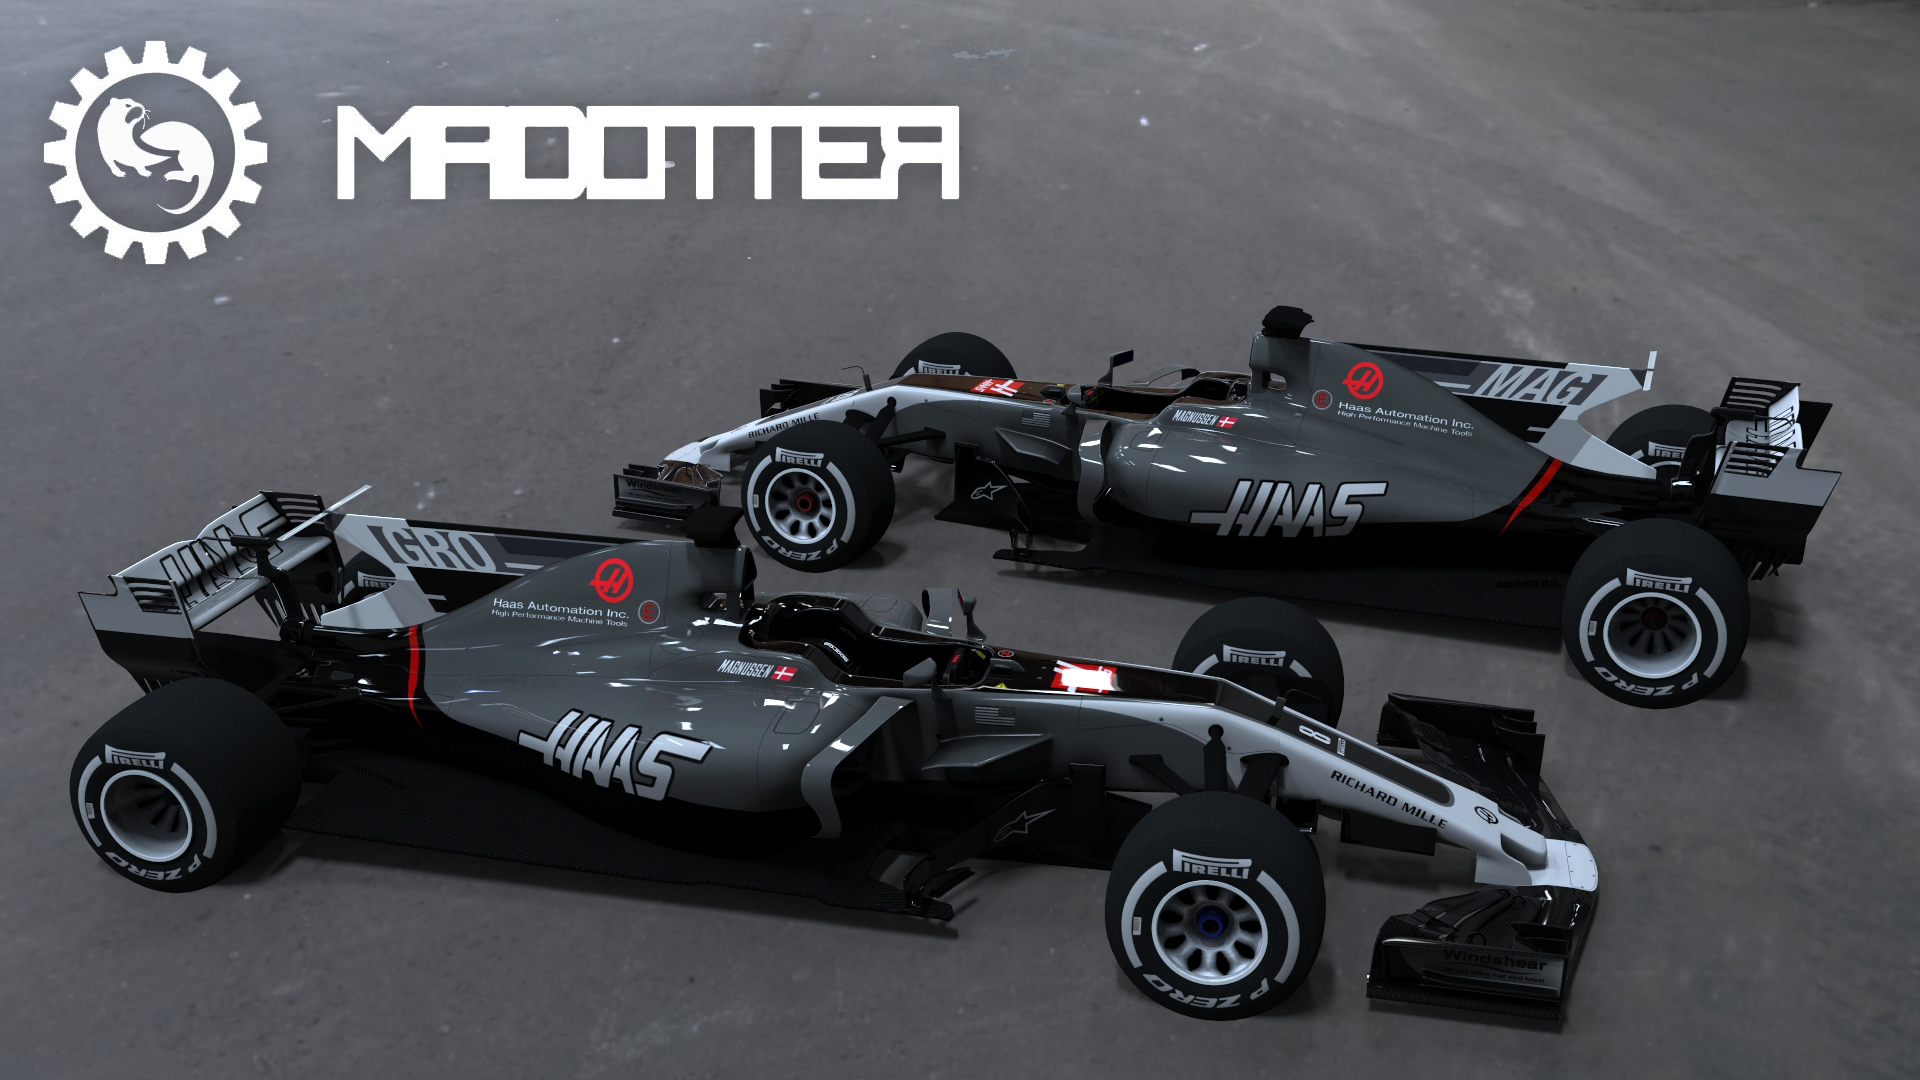 Haas VF17 2 cars.jpg